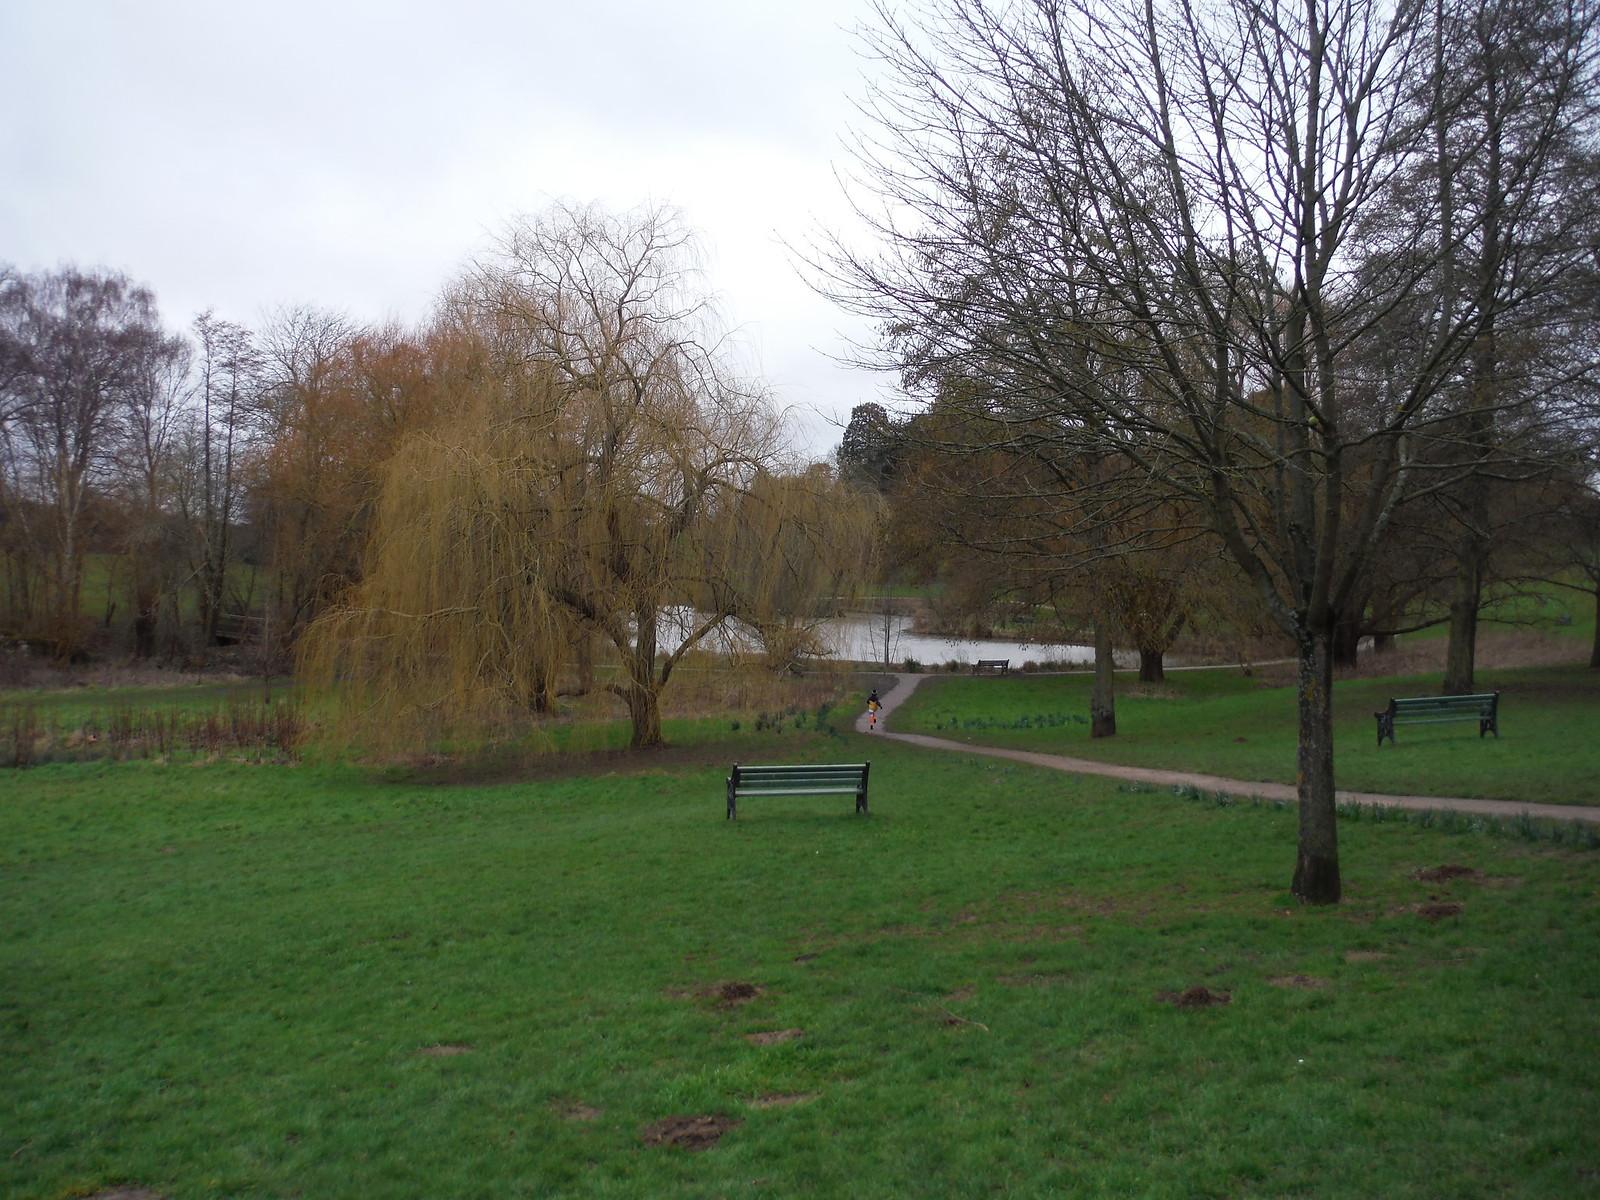 Barclay Park, Broxbourne/Hoddesdon SWC Walk 168 Broxbourne Circular